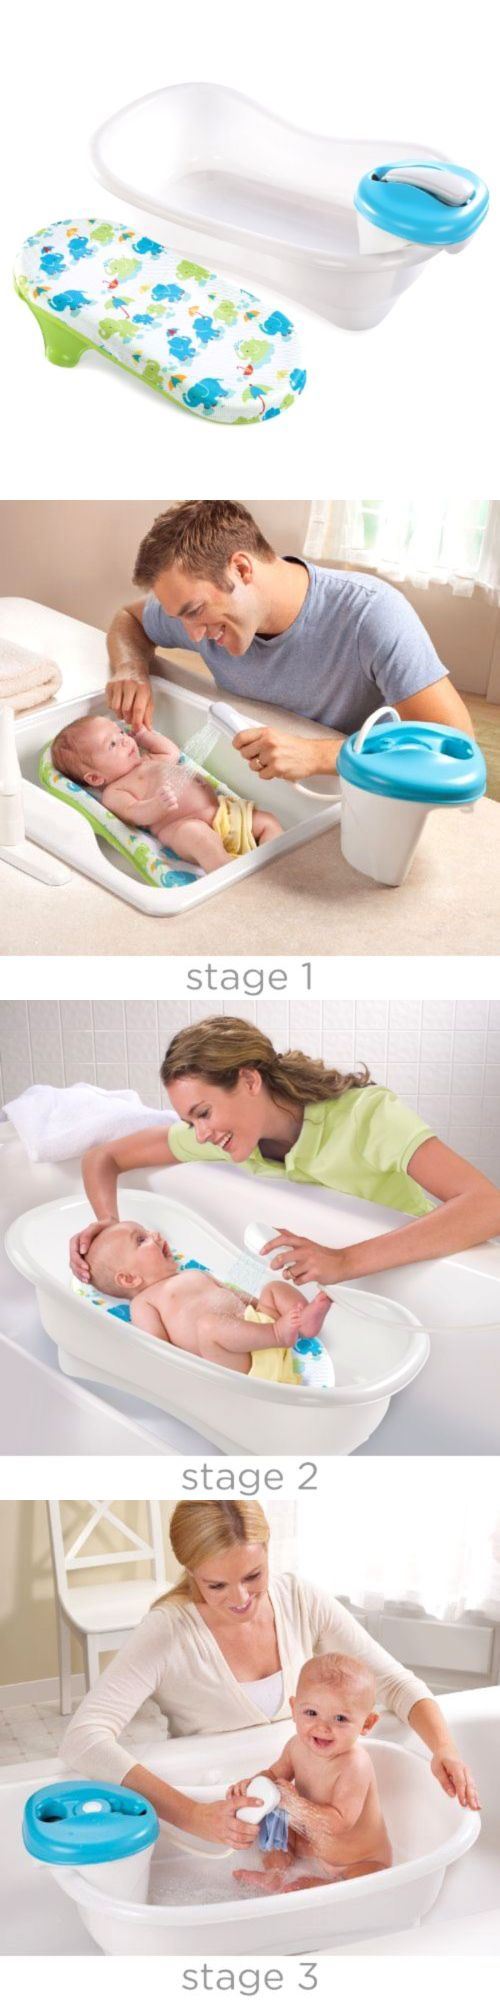 Bath Tubs 113814: Portable Newborn To Toddler Bath Center And Shower ...